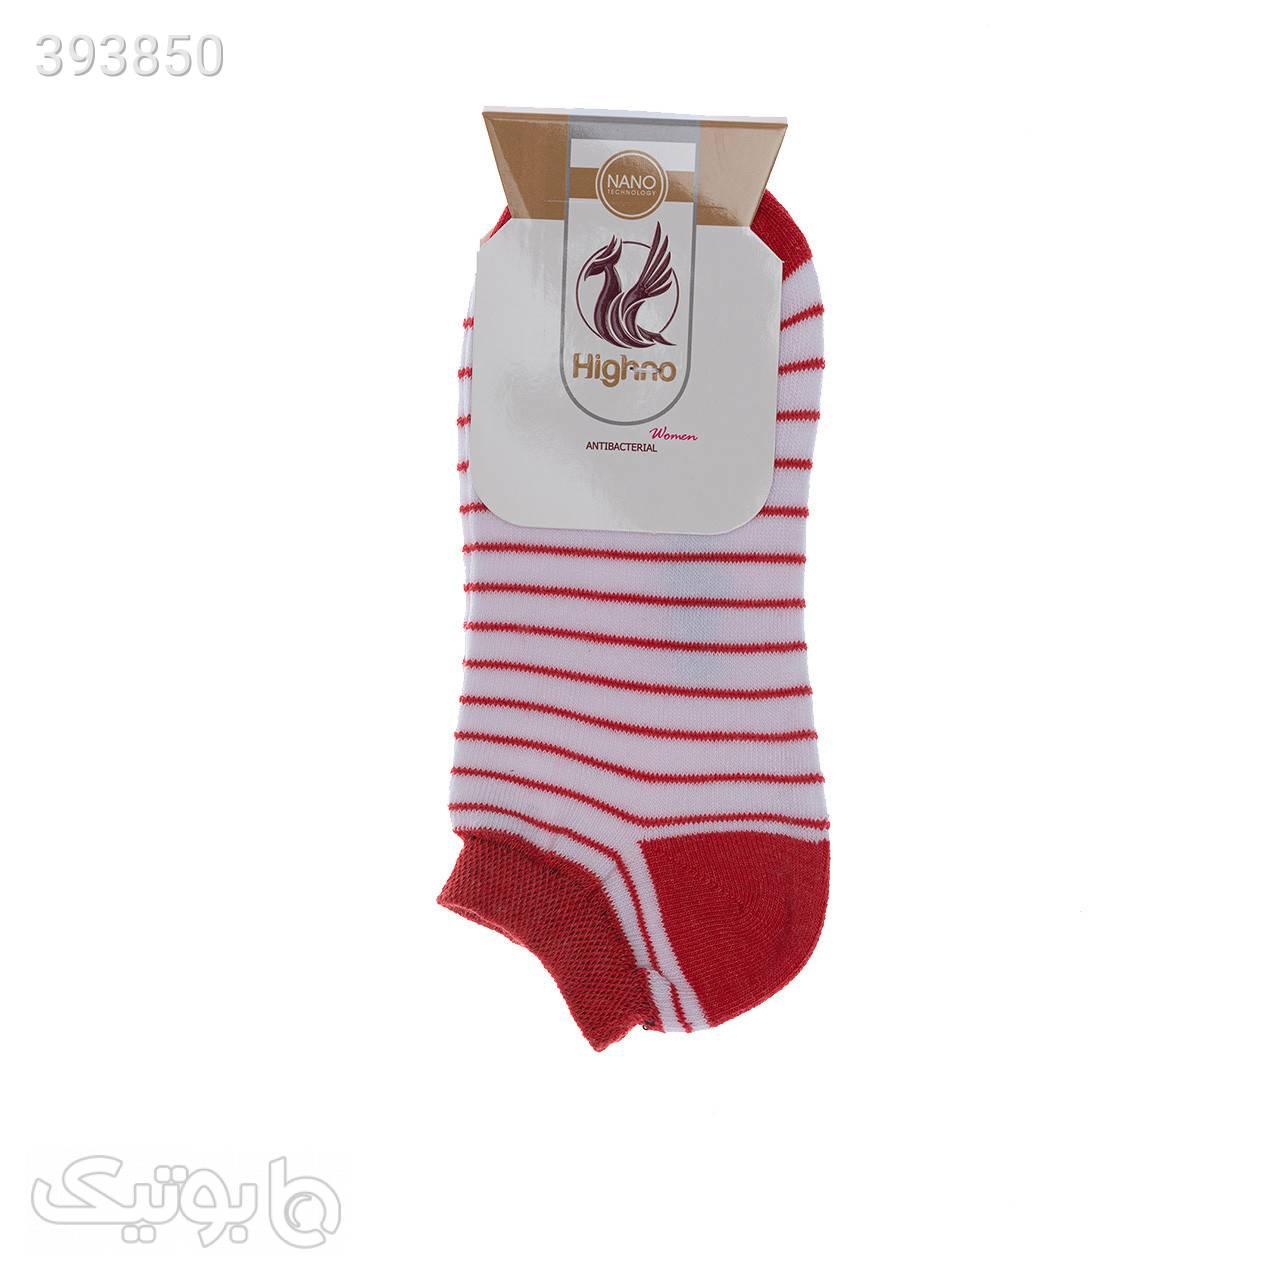 جوراب آنتی باکتریال زنانه مدل 0810-1240 قرمز جوراب و پاپوش